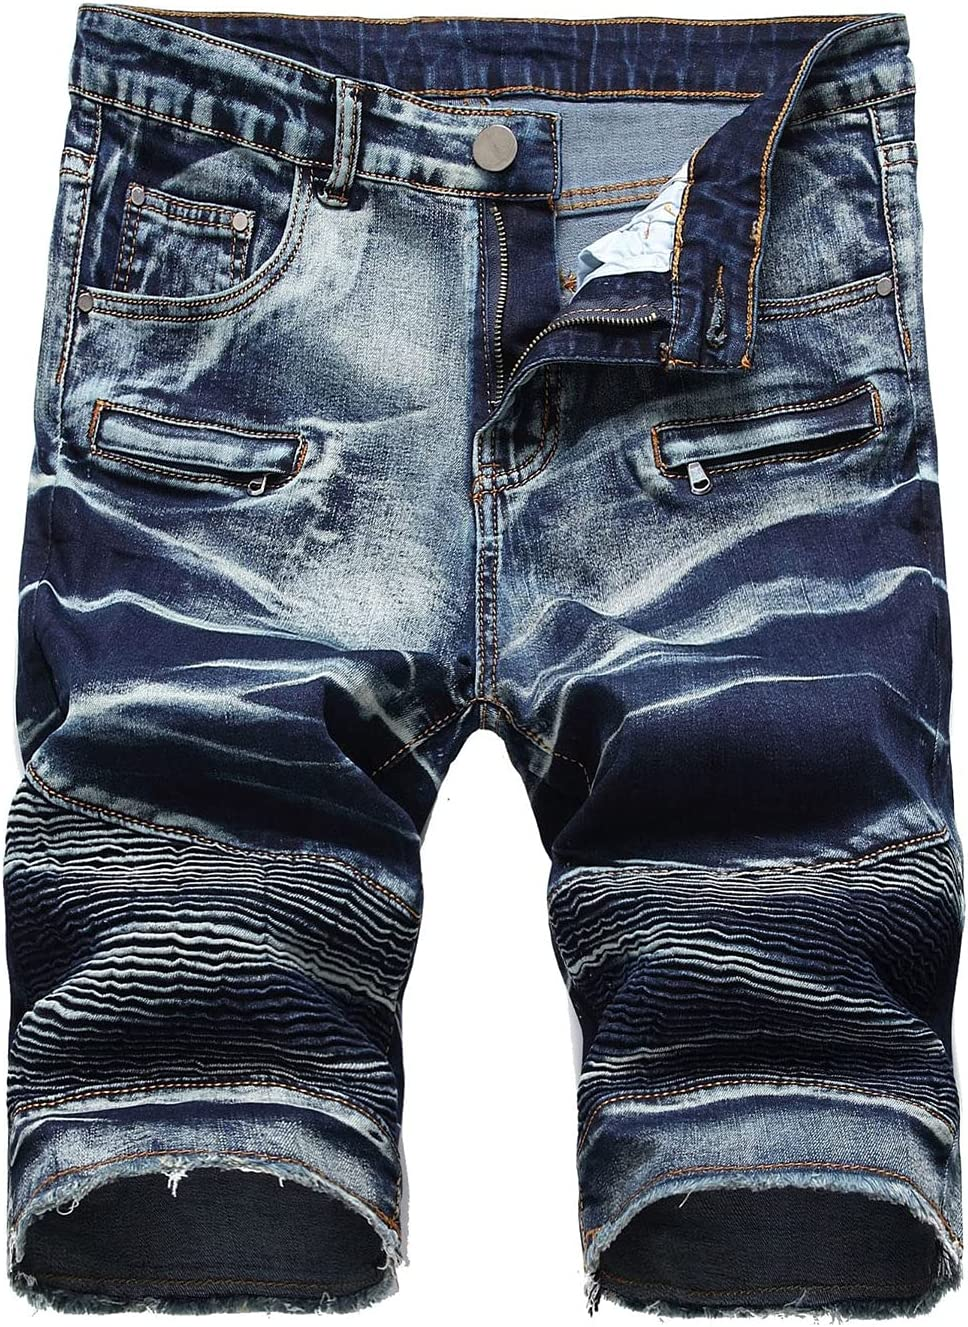 Men's Casual Stretch Slim Jean Short Fashion Retro Distressed Denim Short-pant Straight Fit Biker Pleated Denims Shorts (Dark Blue,28)